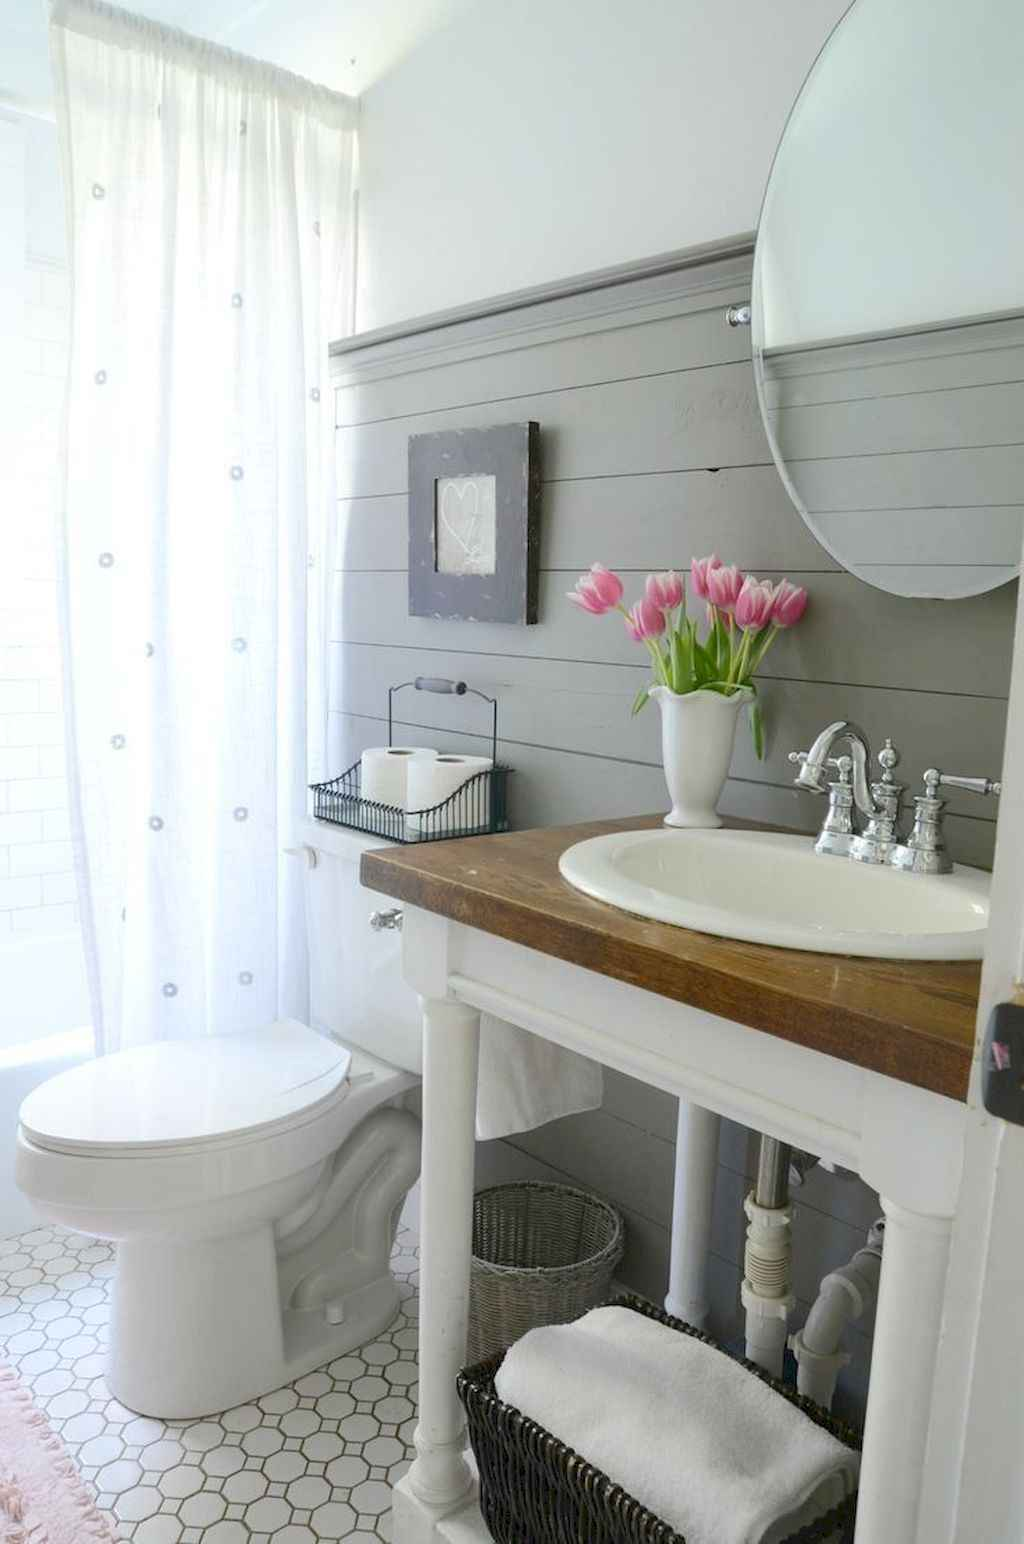 125 awesome farmhouse bathroom vanity remodel ideas (29)